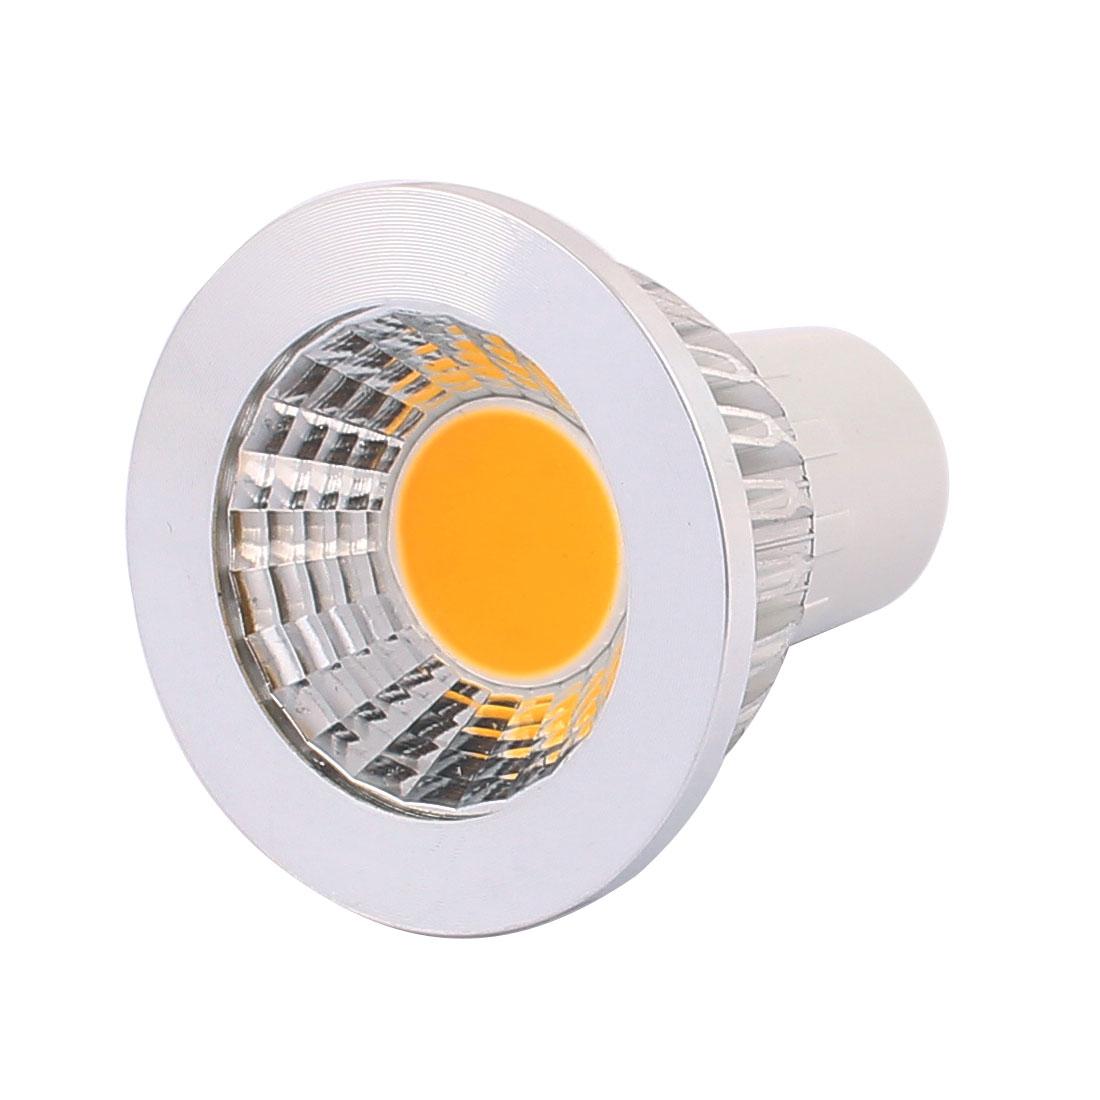 AC85-265V 3W GU5.3 Base COB LED Spotlight Bulb Downlight Energy Saving Warm White